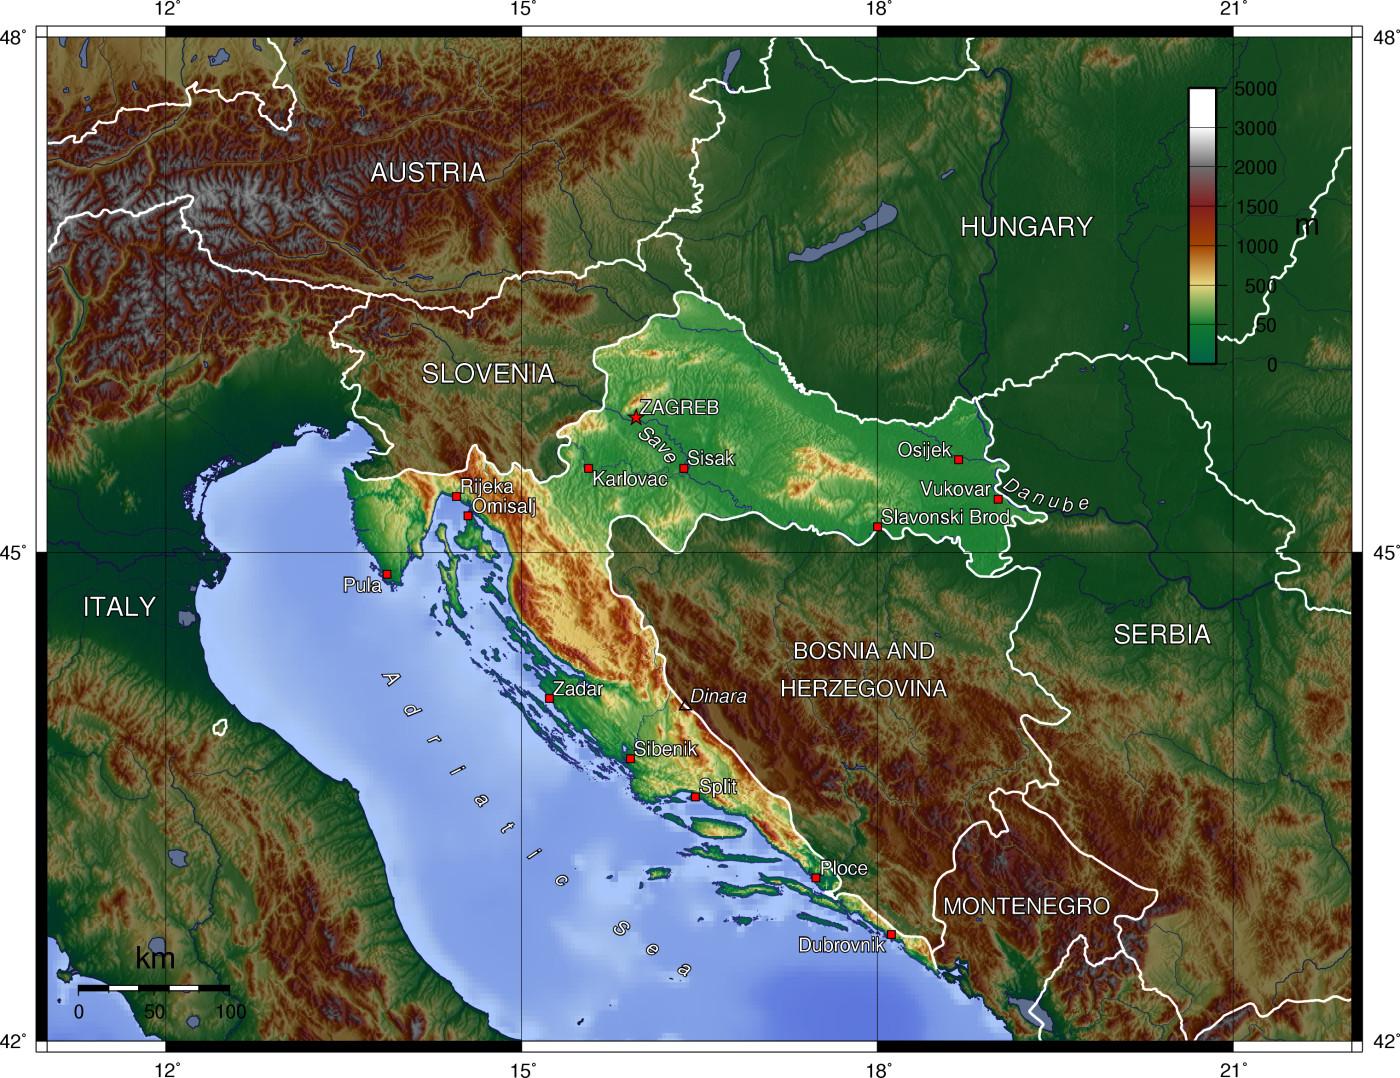 Image:Croatia topo